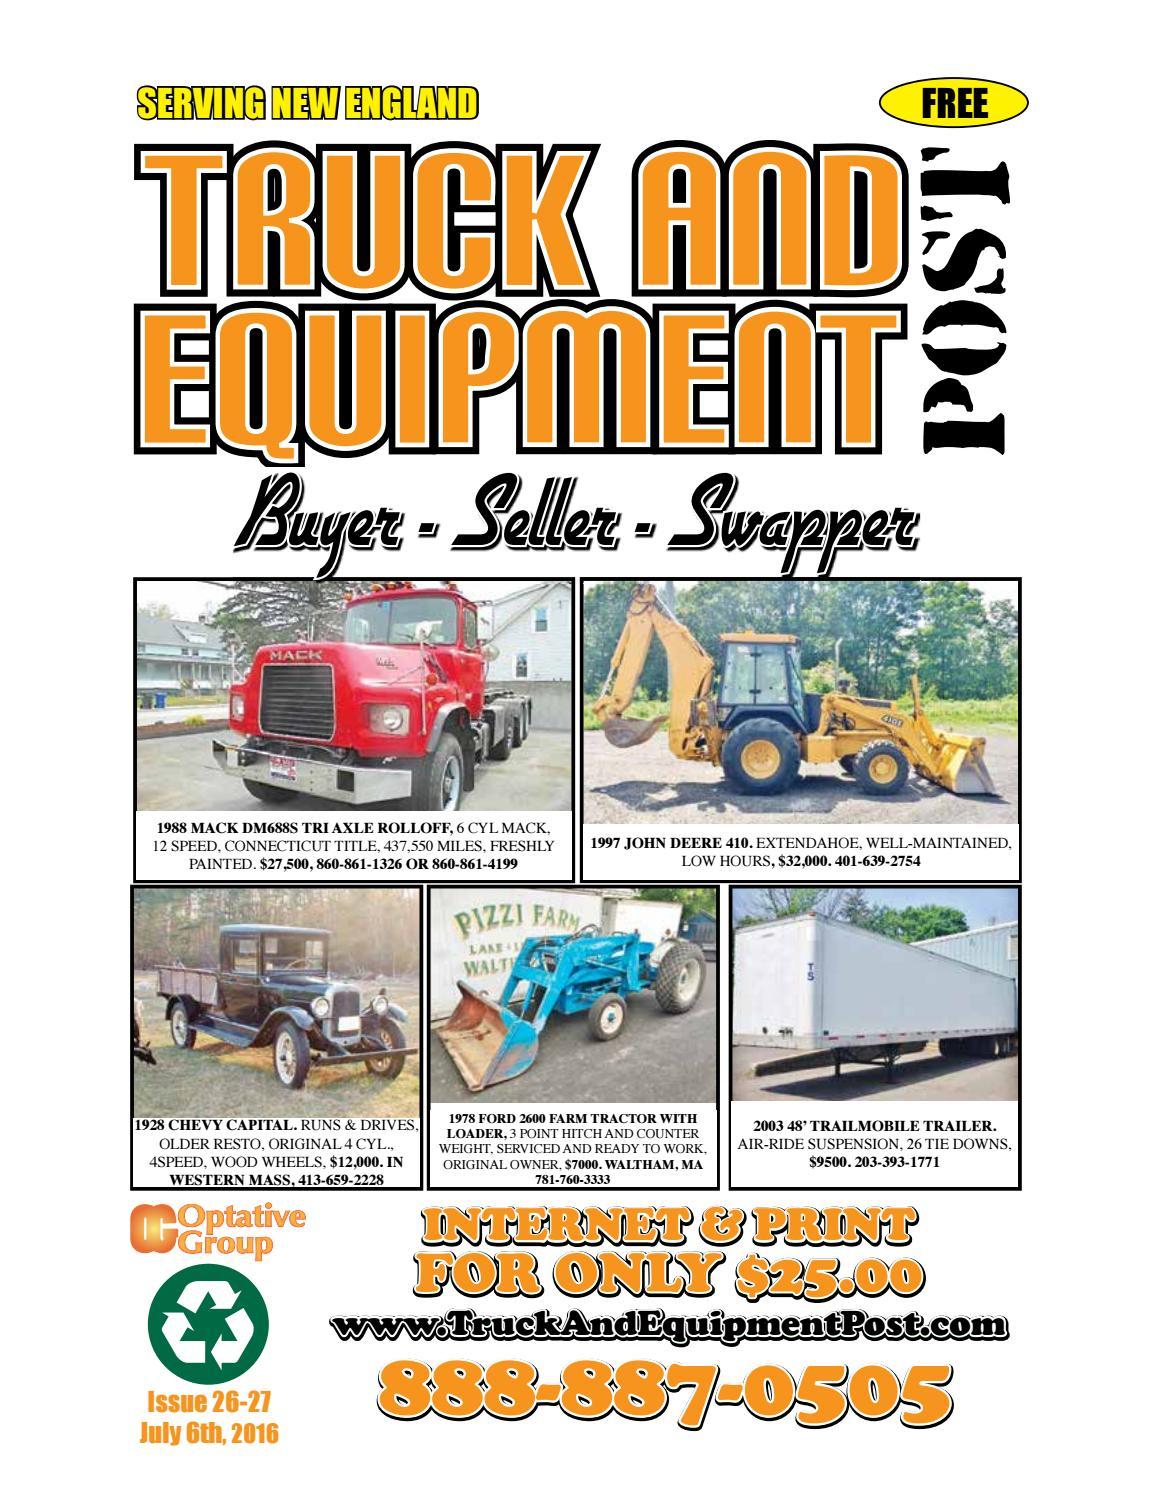 Truck Equipment Post 26 27 2016 By 1clickaway Issuu Pacar W900 Fuse Diagram 2001